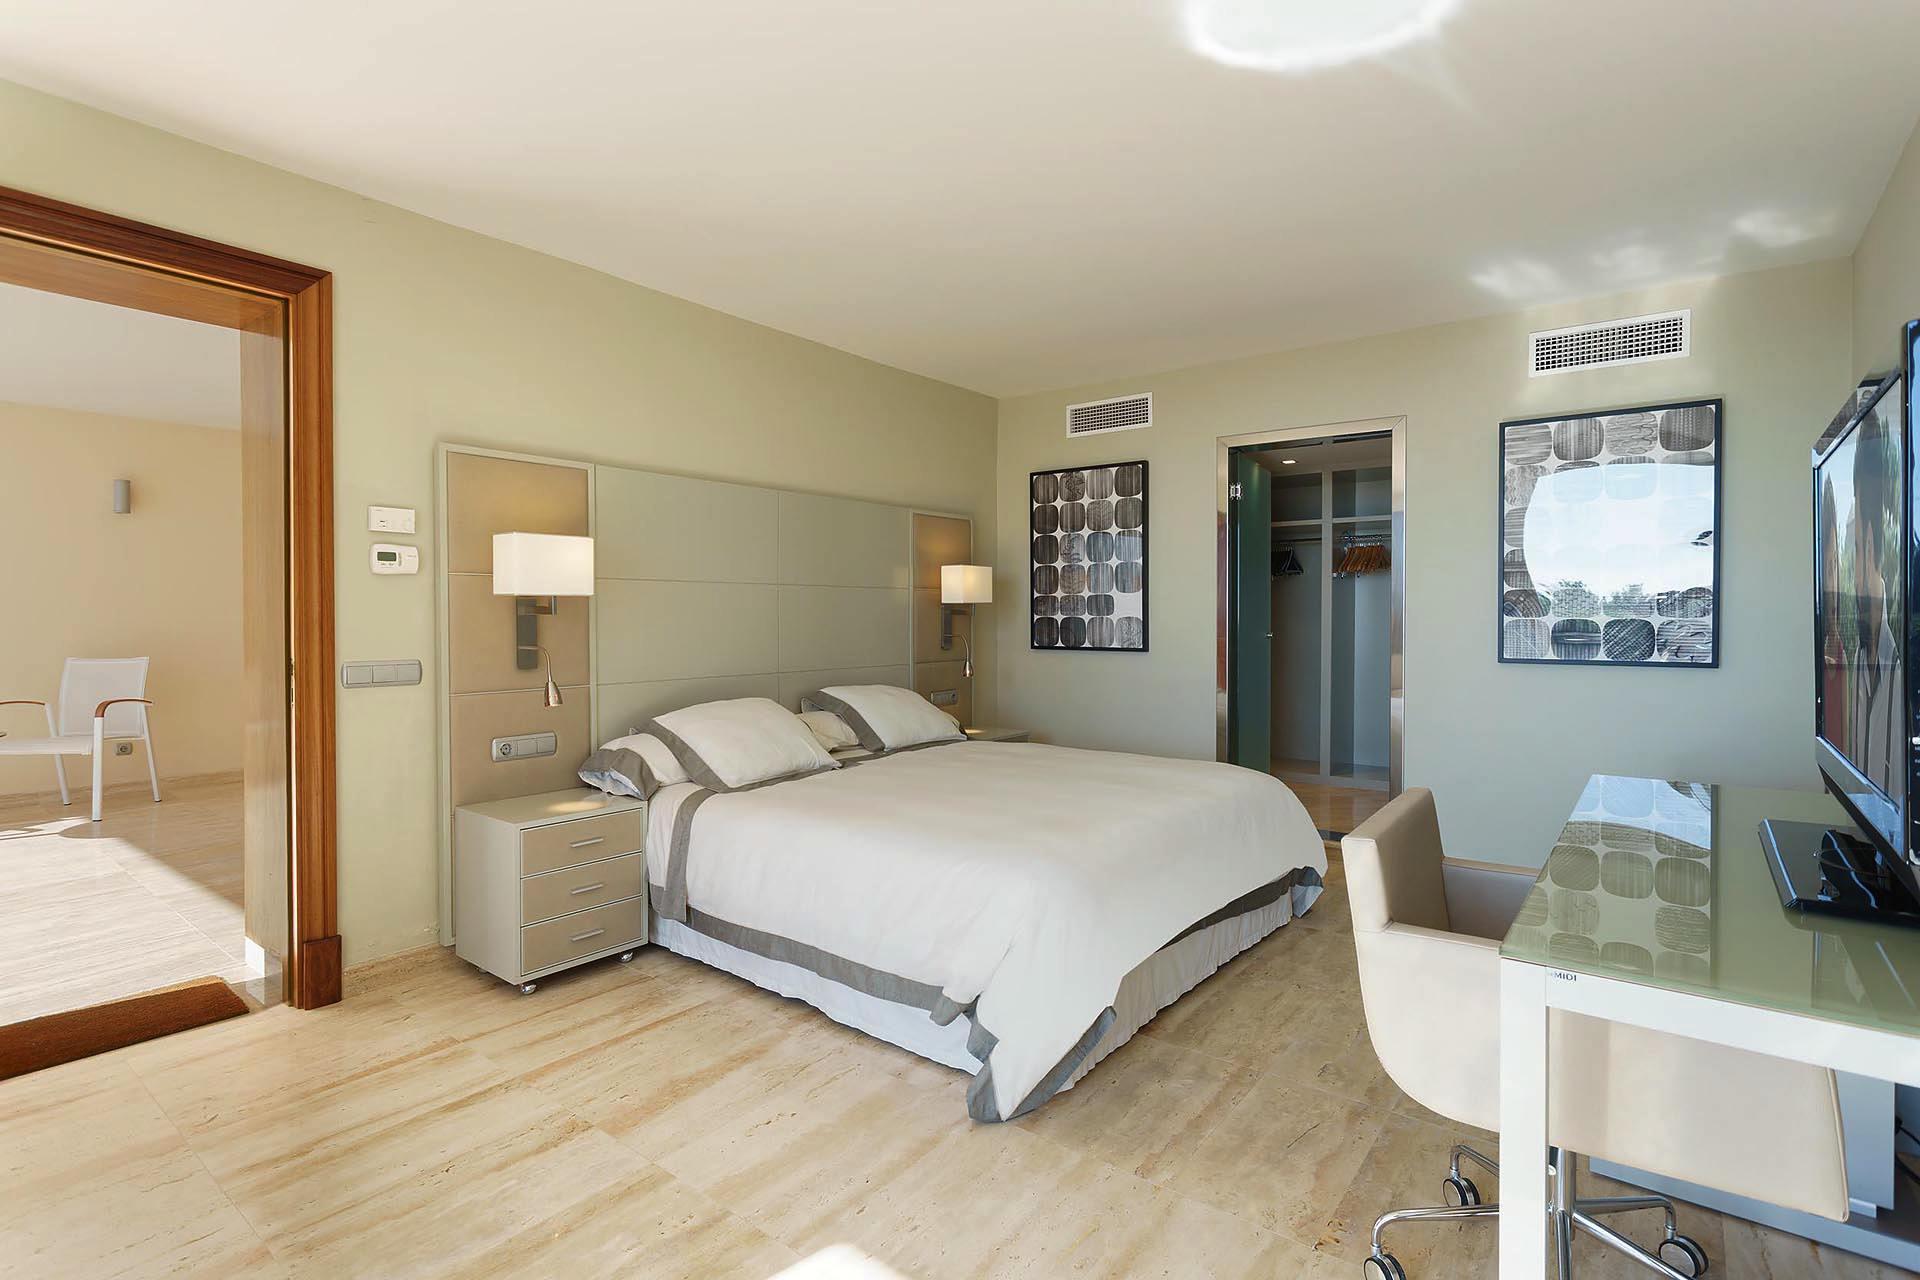 01-280 großzügige Villa nahe Palma de Mallorca Bild 32